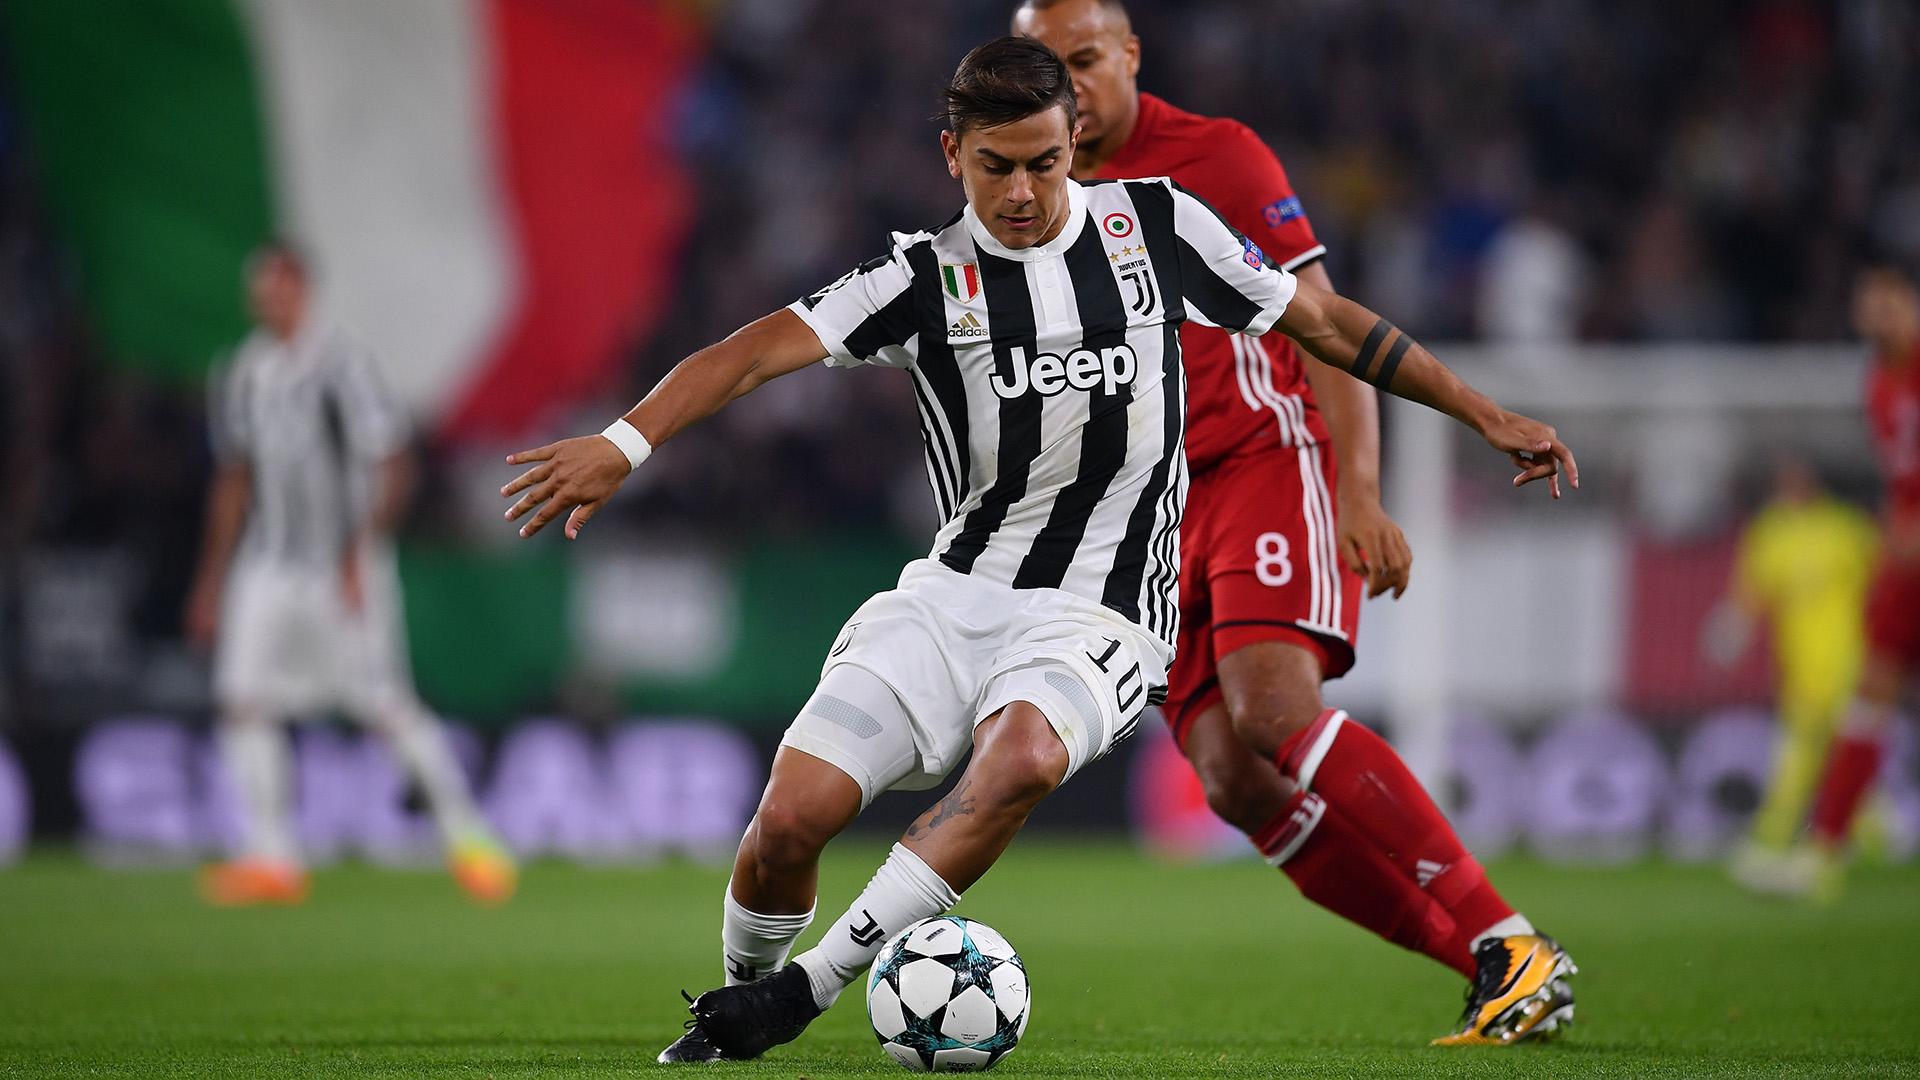 Paulo Dybala Juventus Olympiacos Champions League